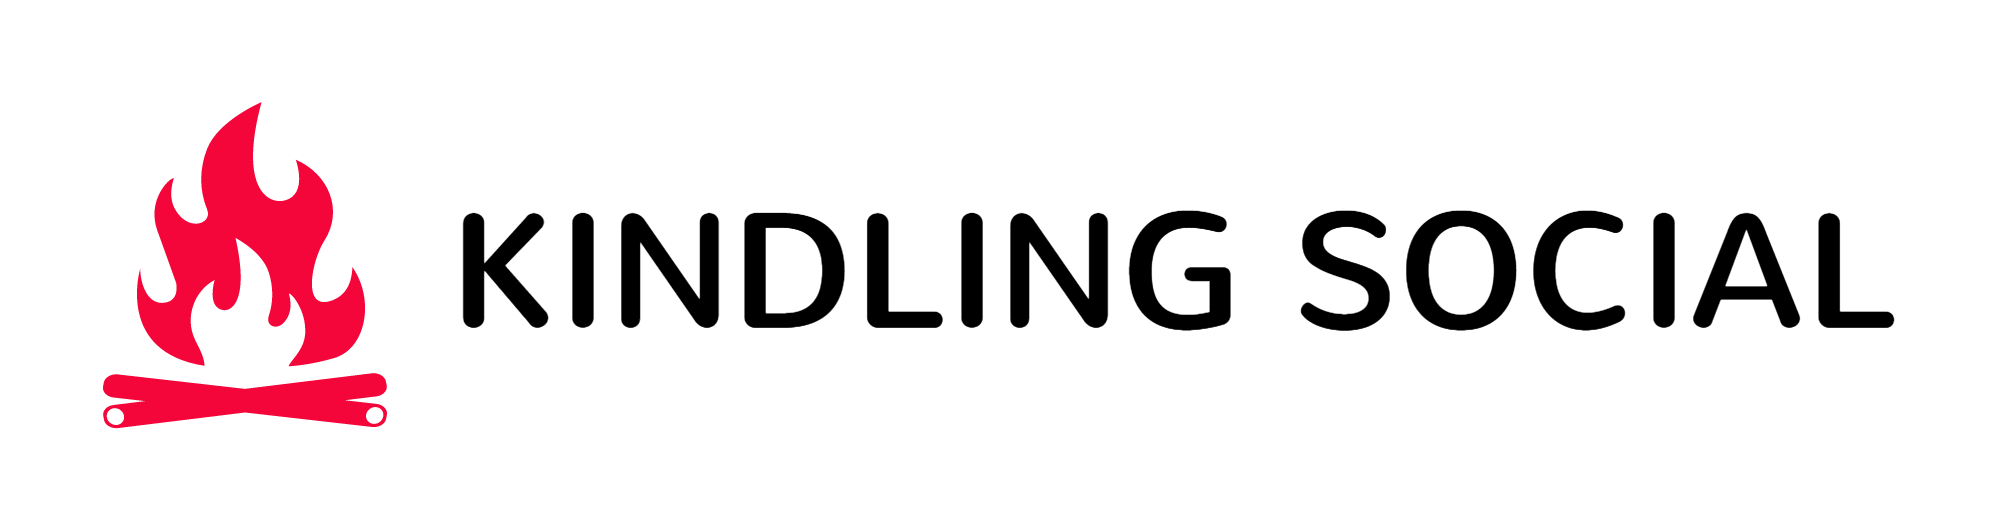 KS Logo Black.png